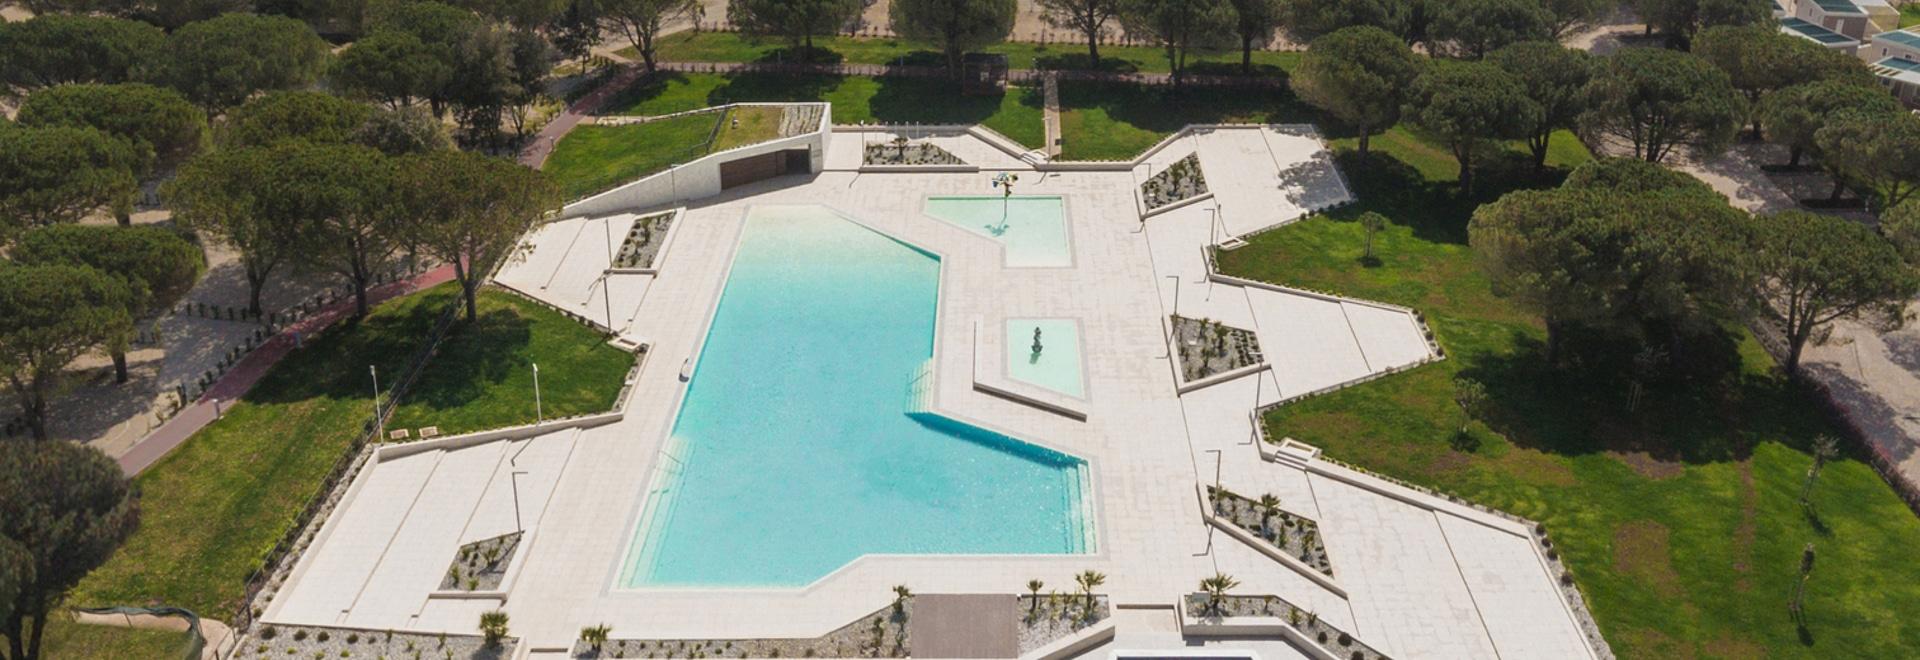 Camping Stella Maris Swimming Pool and Reception / NFO